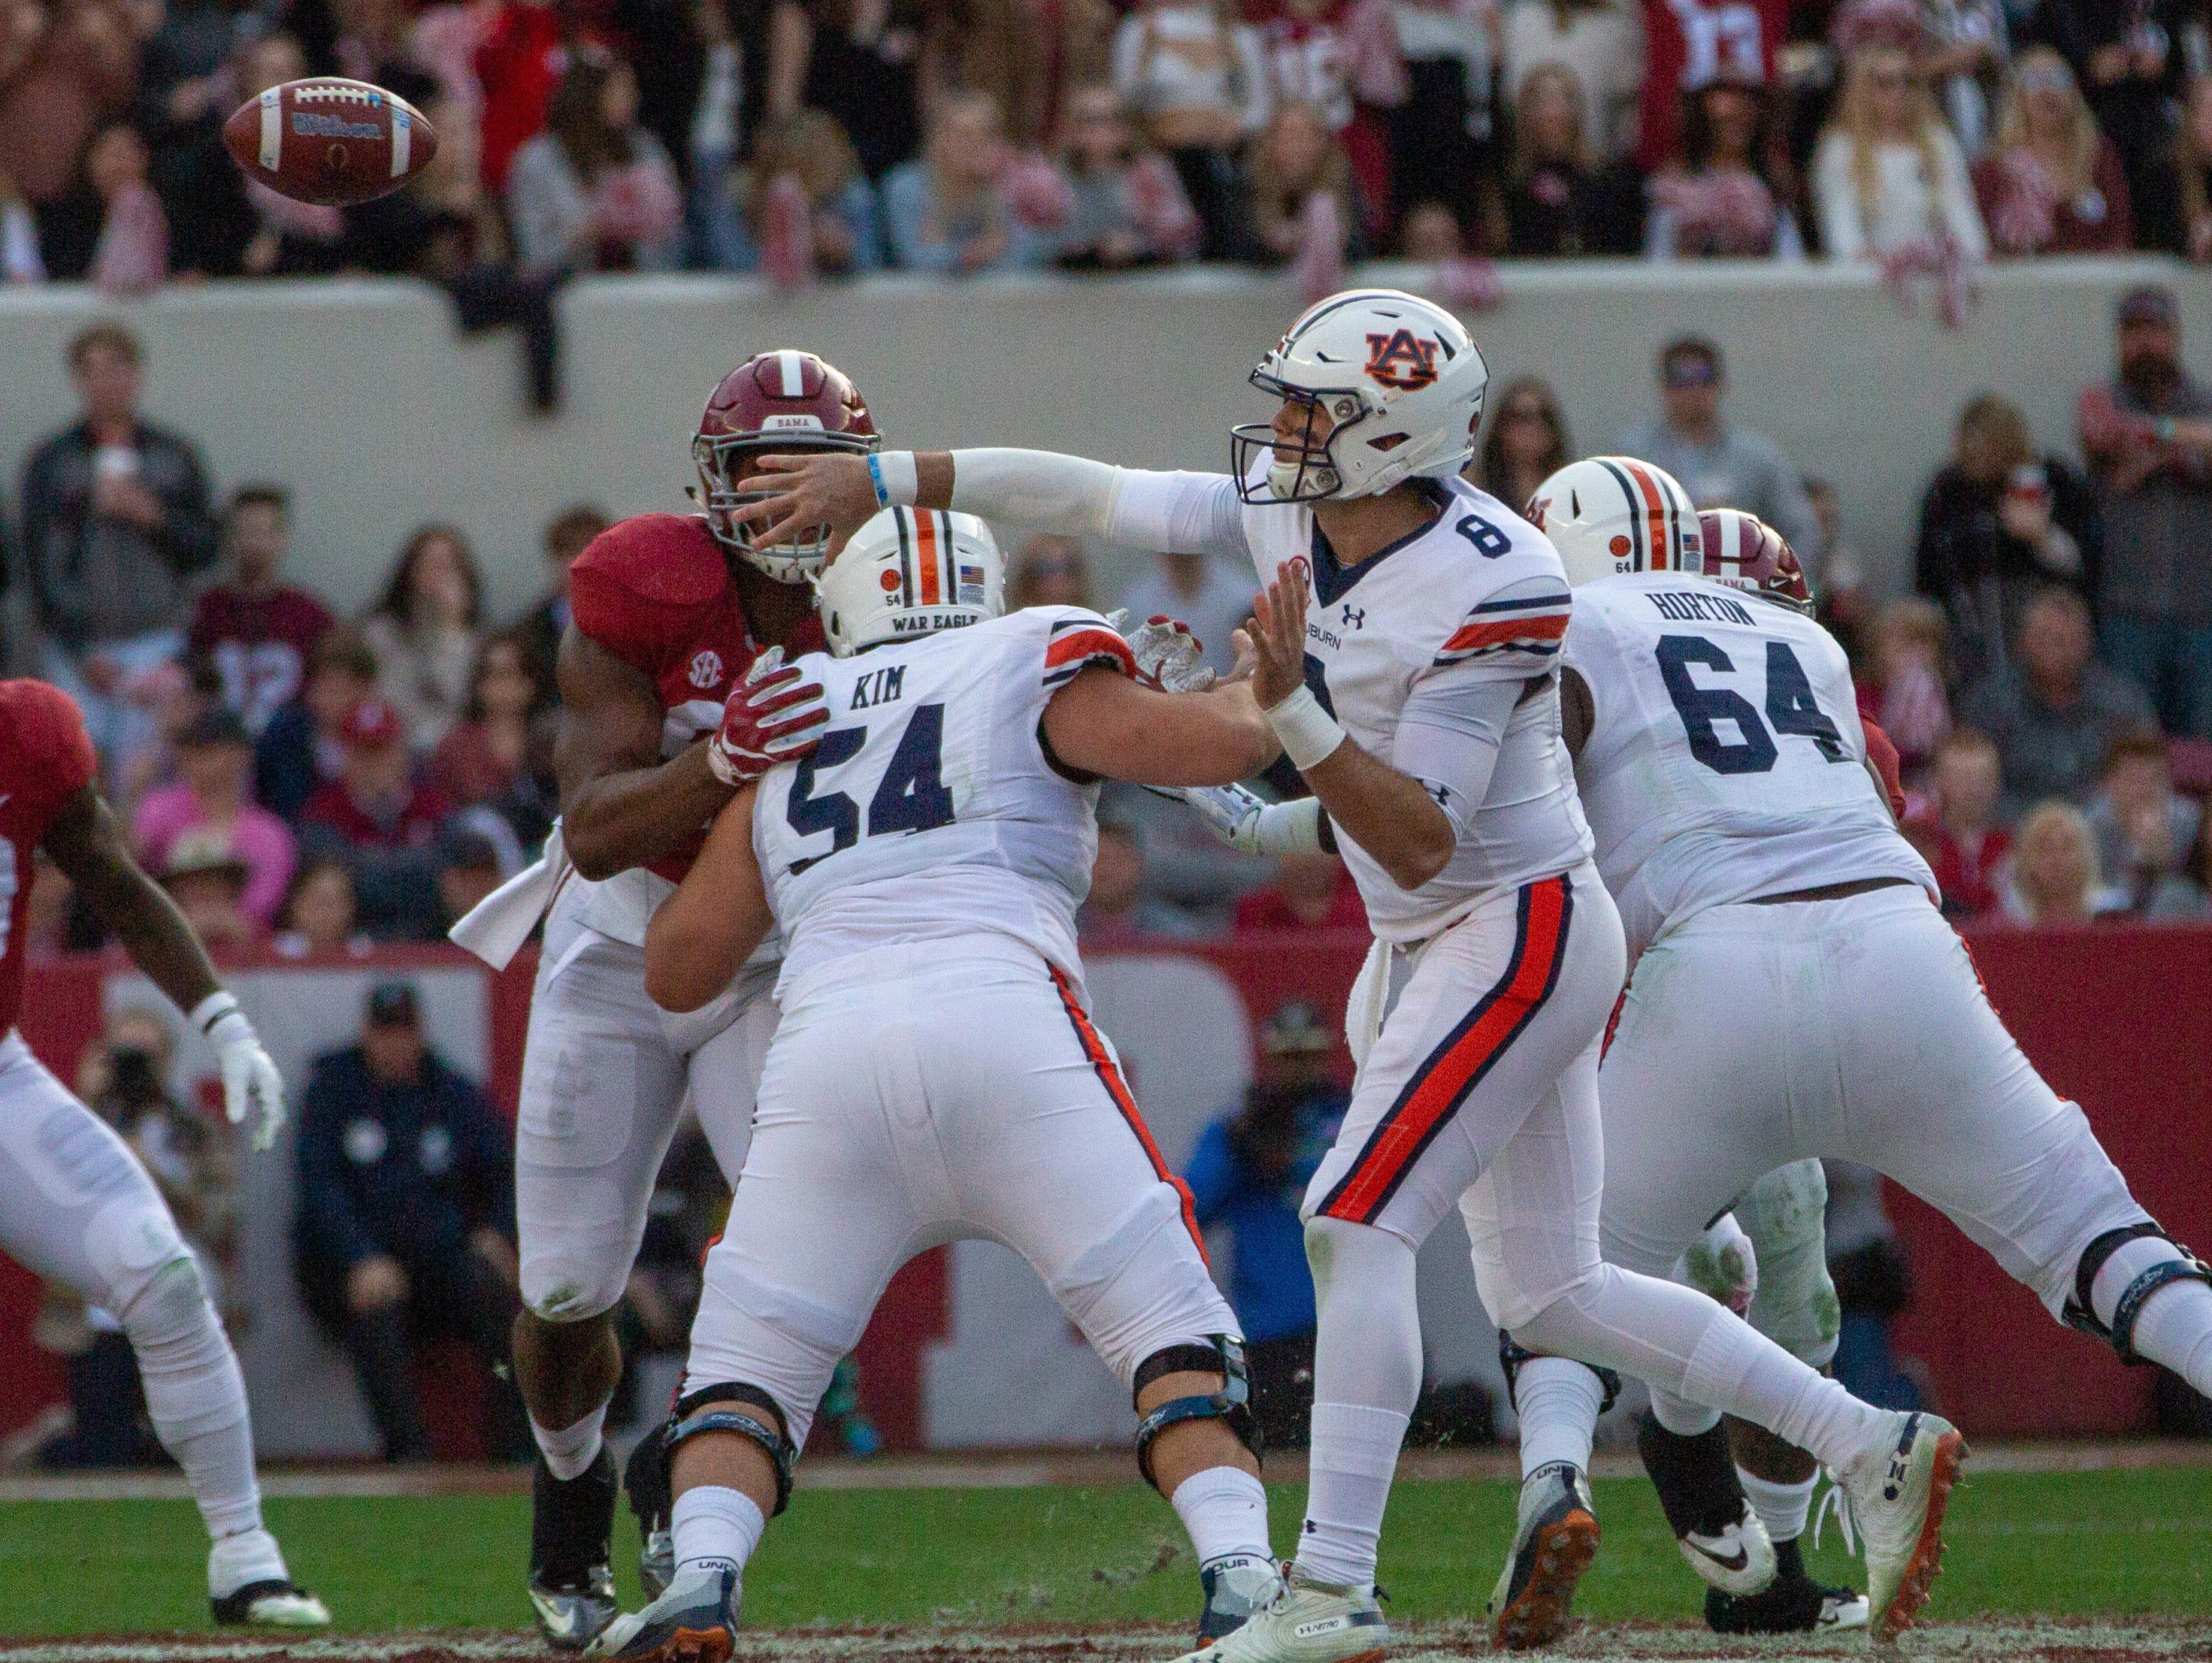 Auburn's Jarrett Stidham throws the ball during the first quarter of the Iron Bowl.